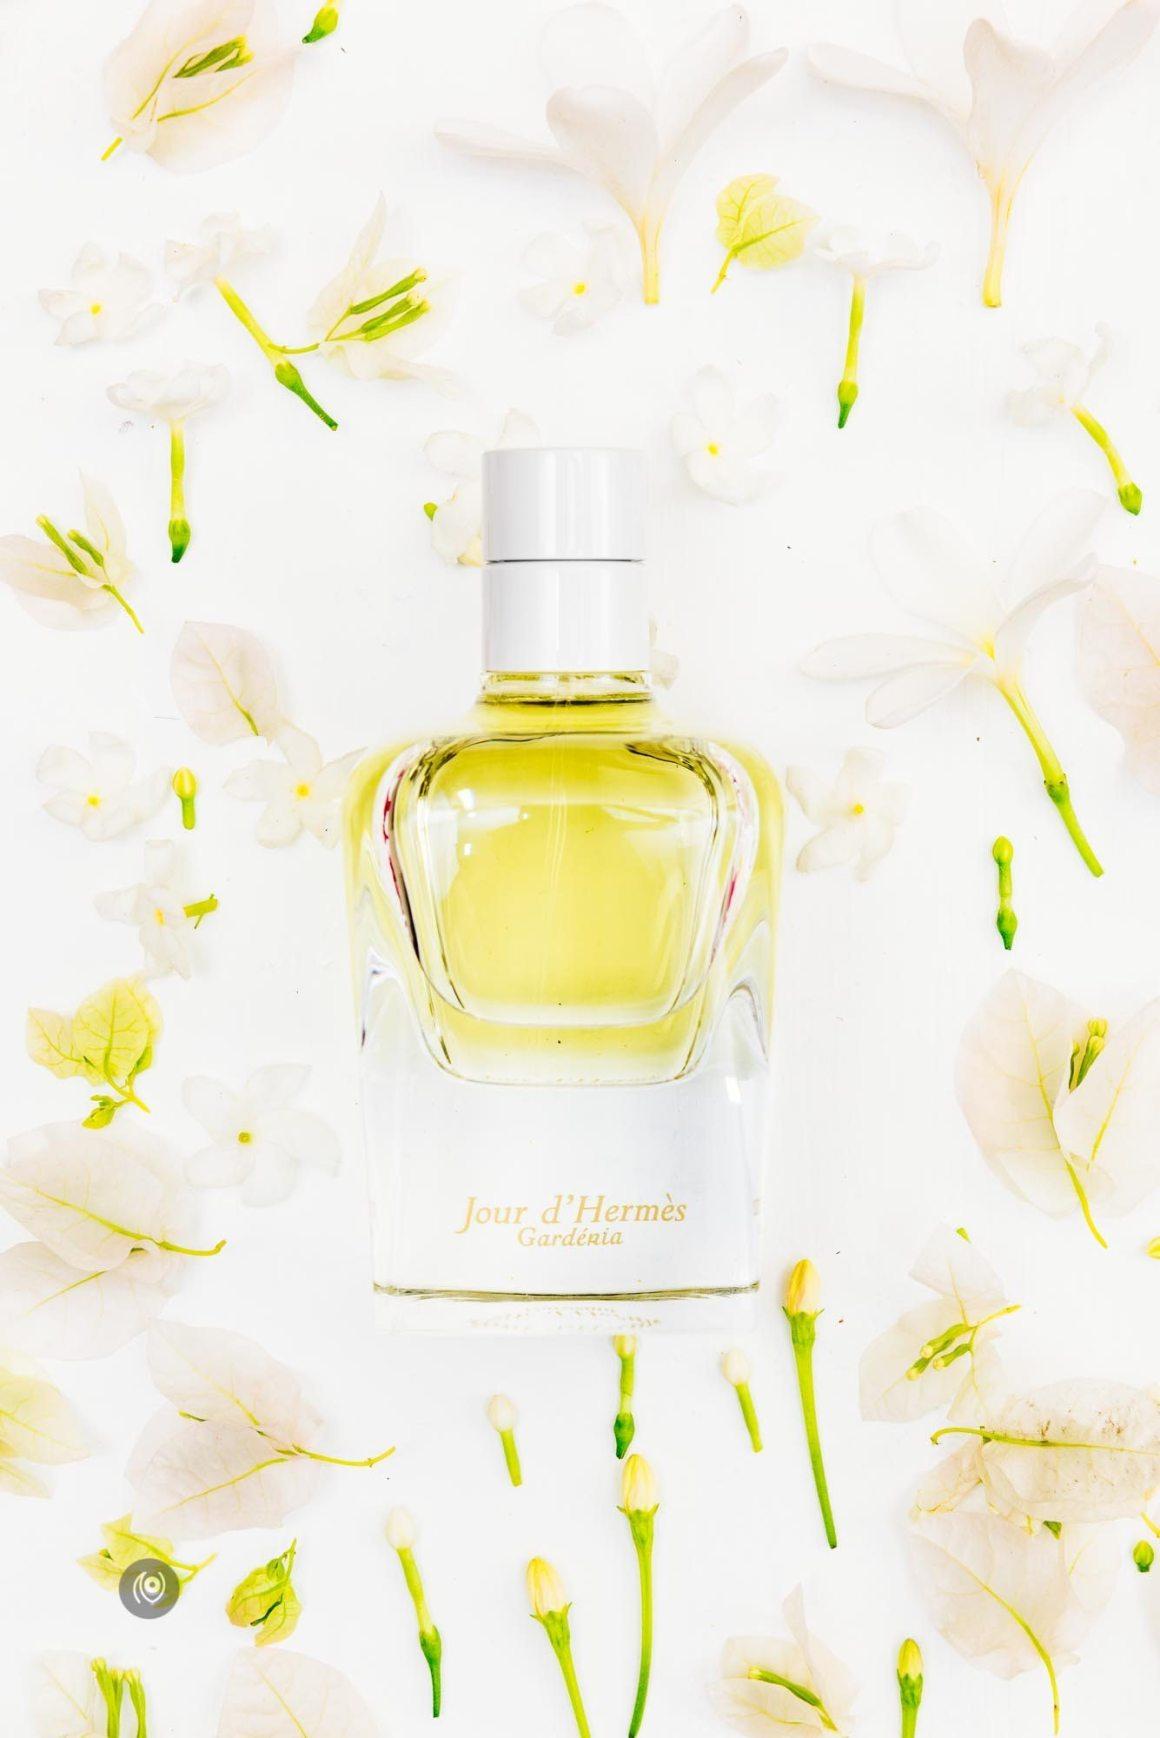 FragranceOfTheMonth-Naina.co-Jour-Hermes-Gardenia-EyesForLuxury-05